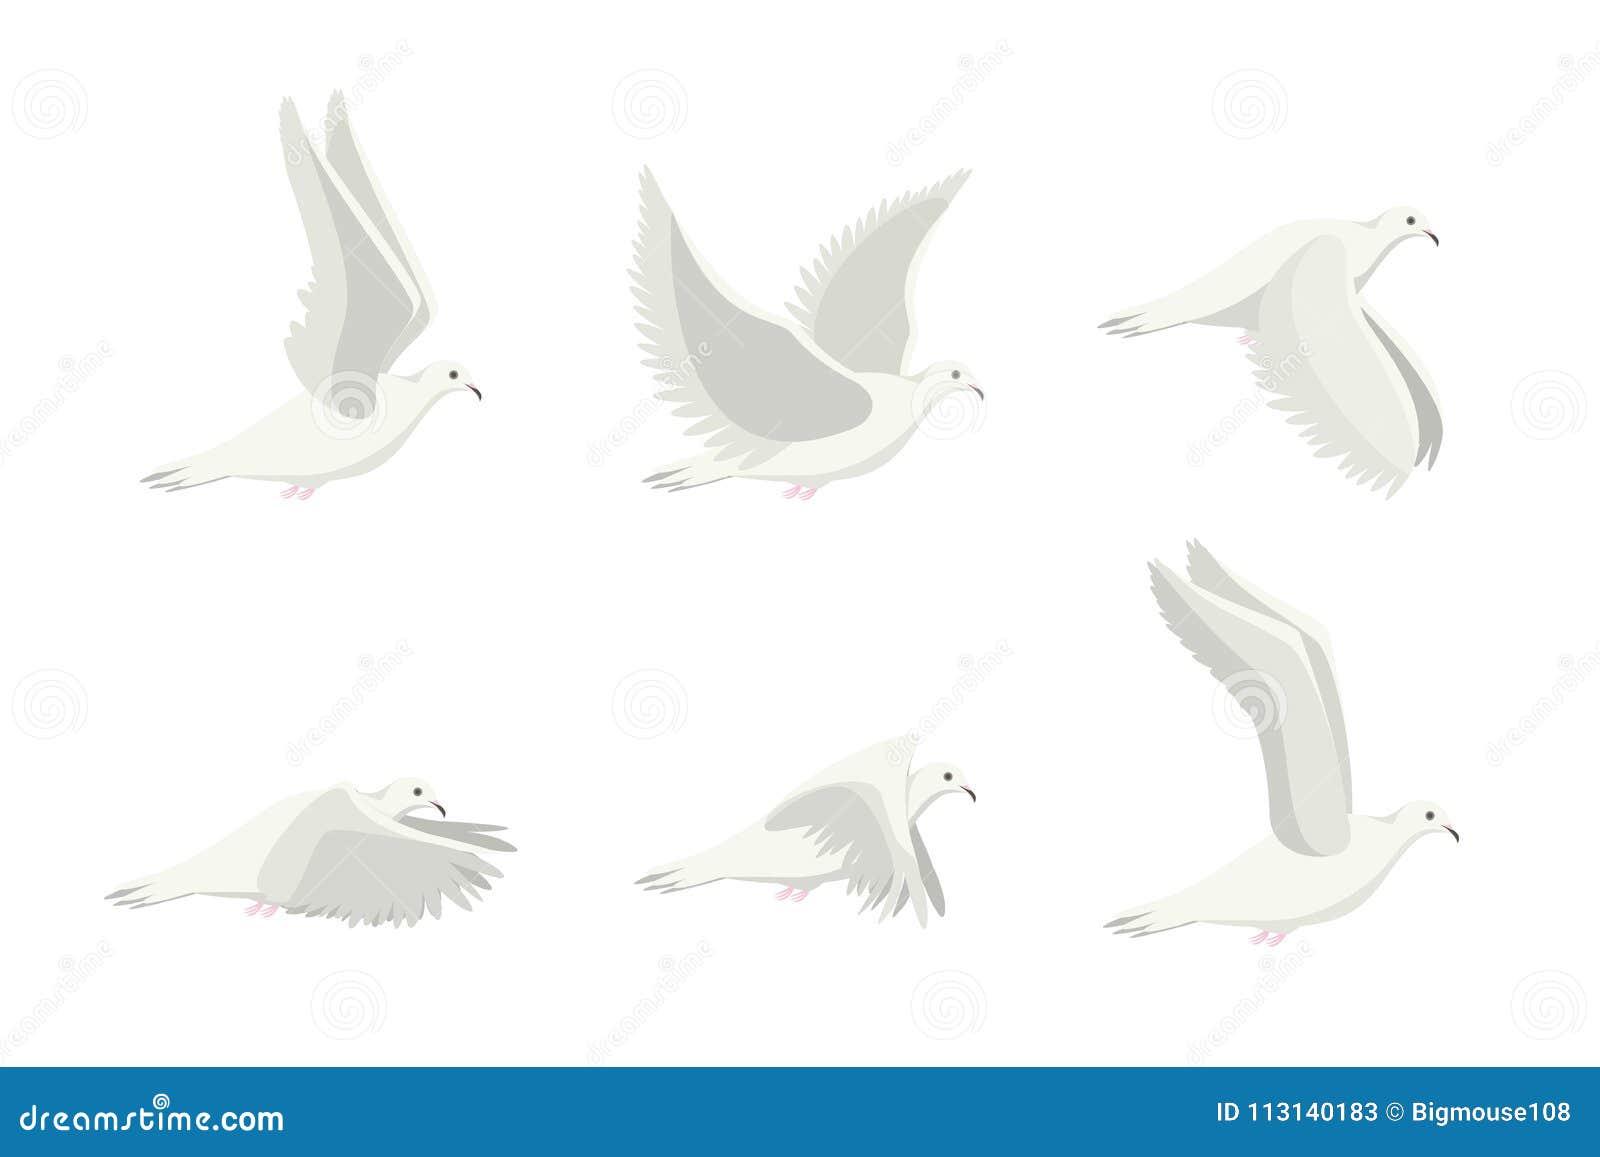 Cartoon White Dove Bird Set Vector Stock Vector Illustration Of